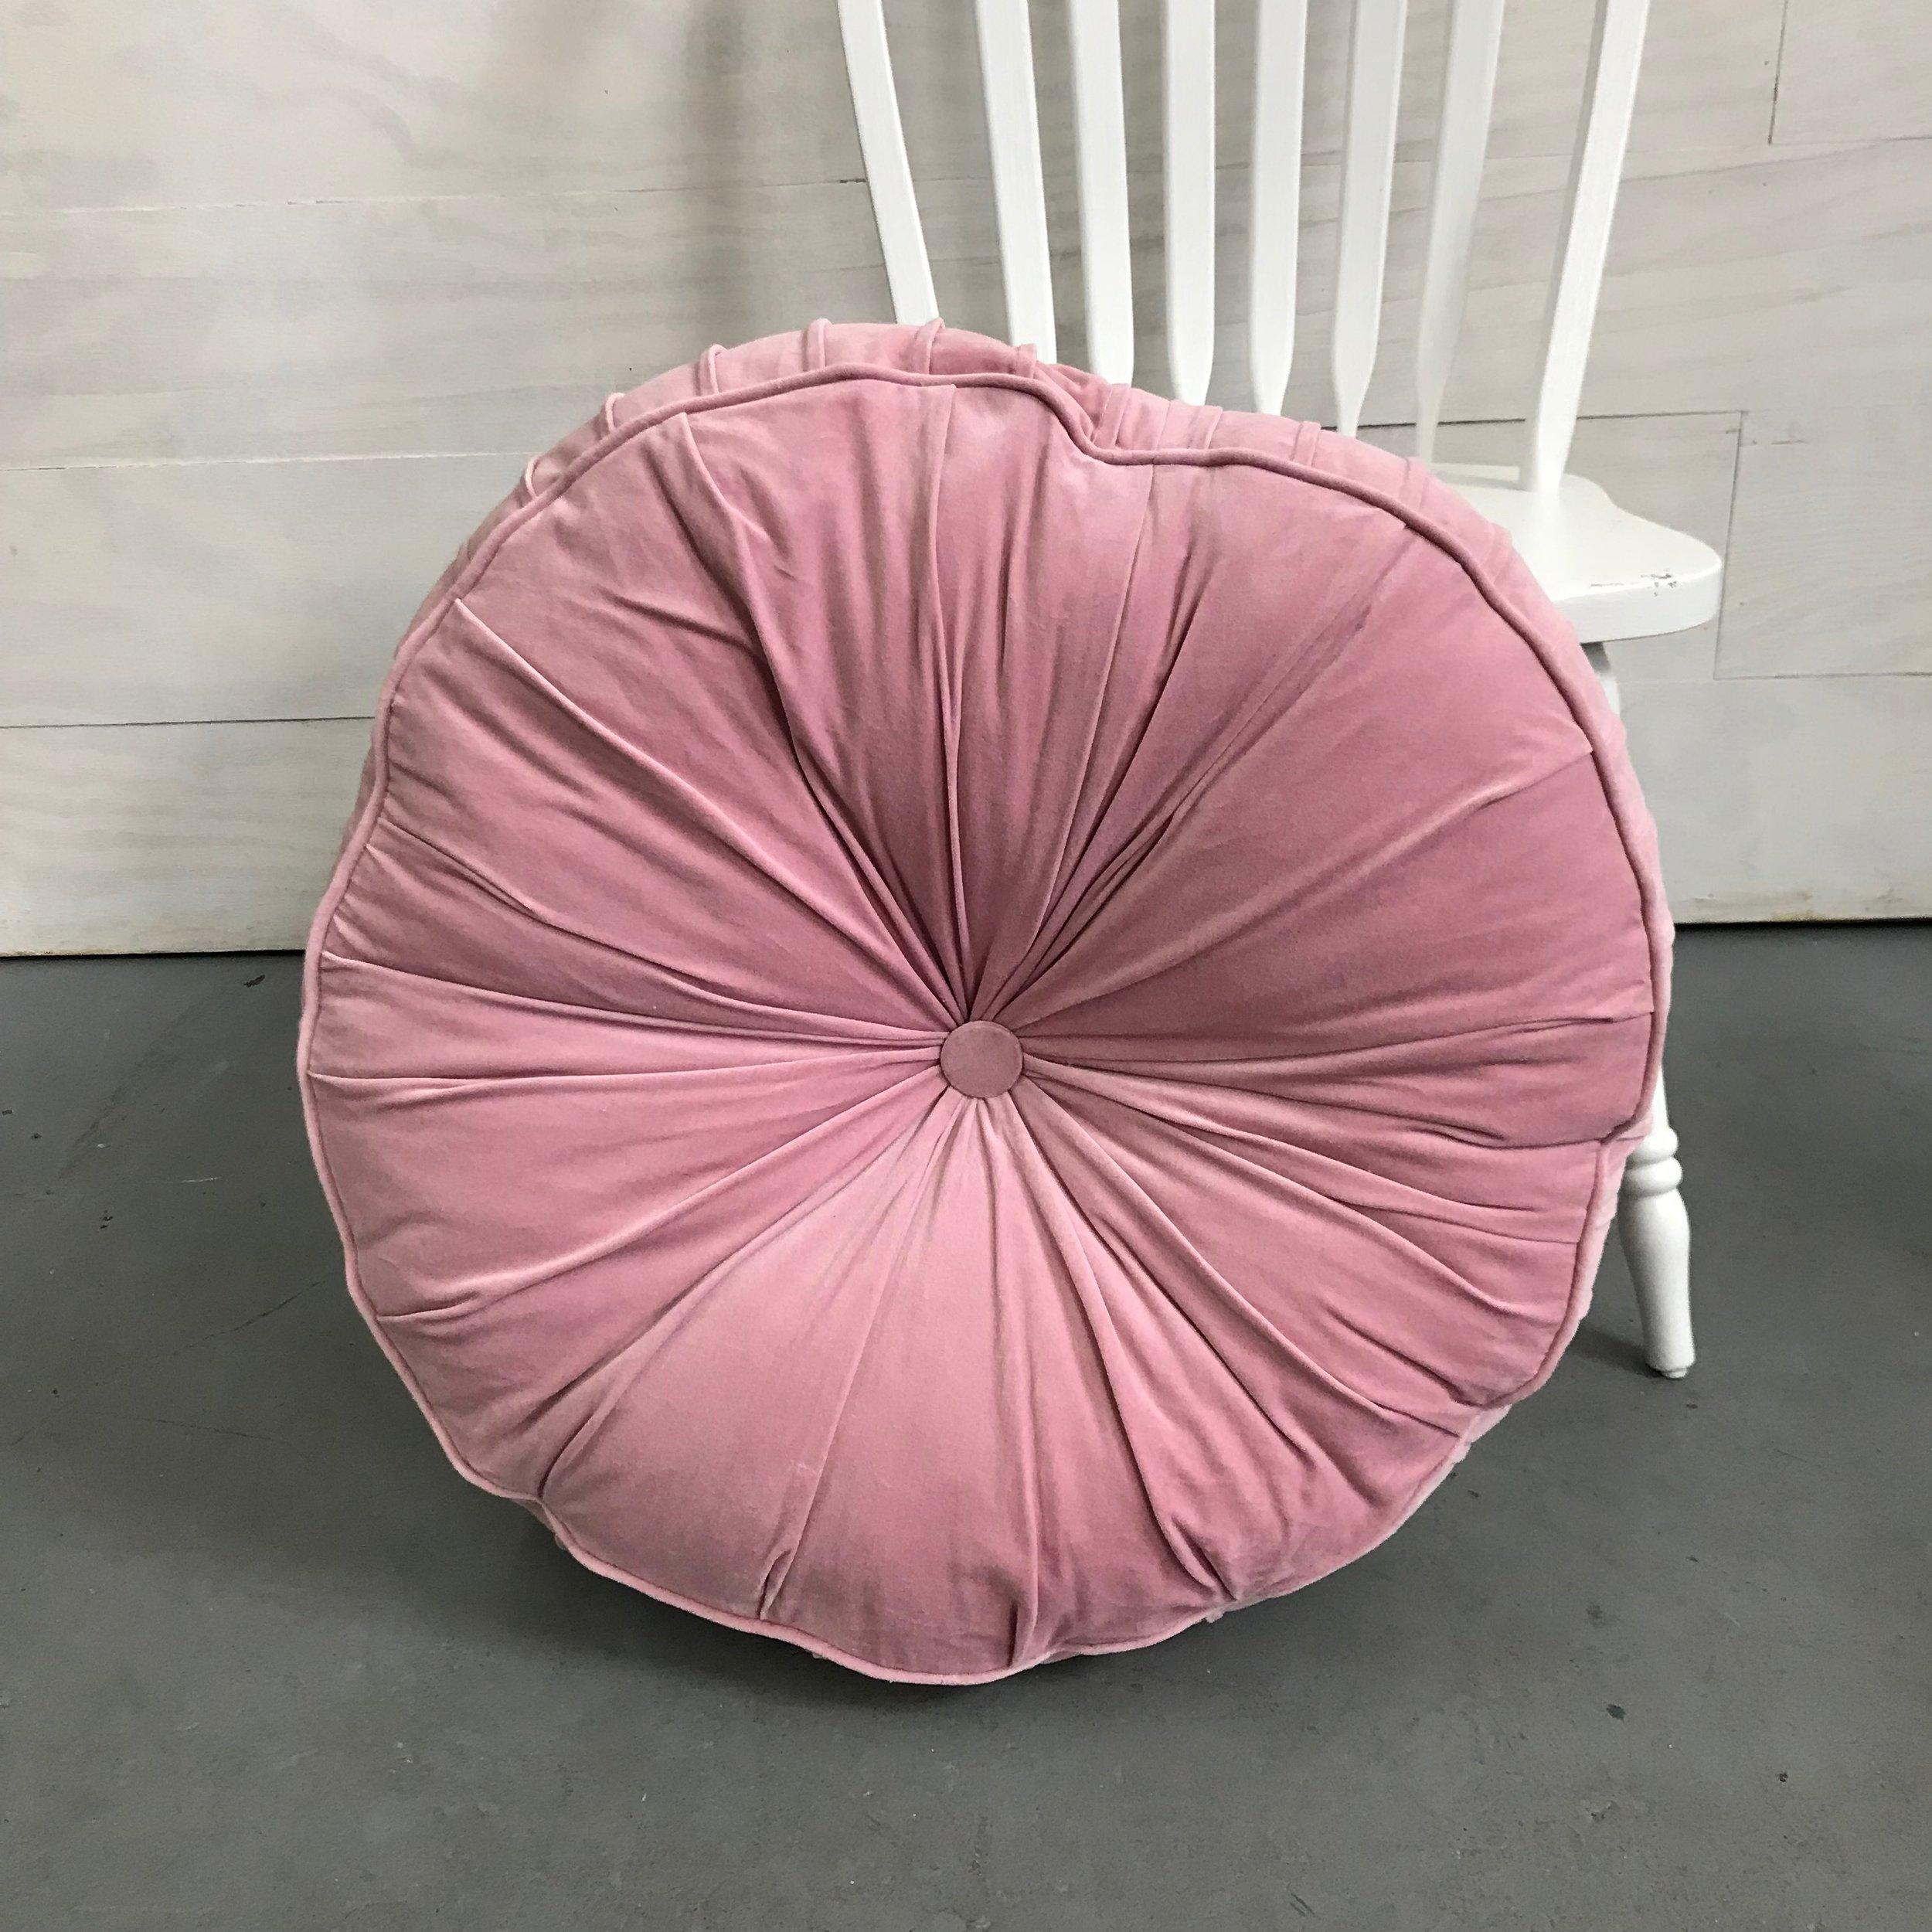 Soft Pink Floor Cushion